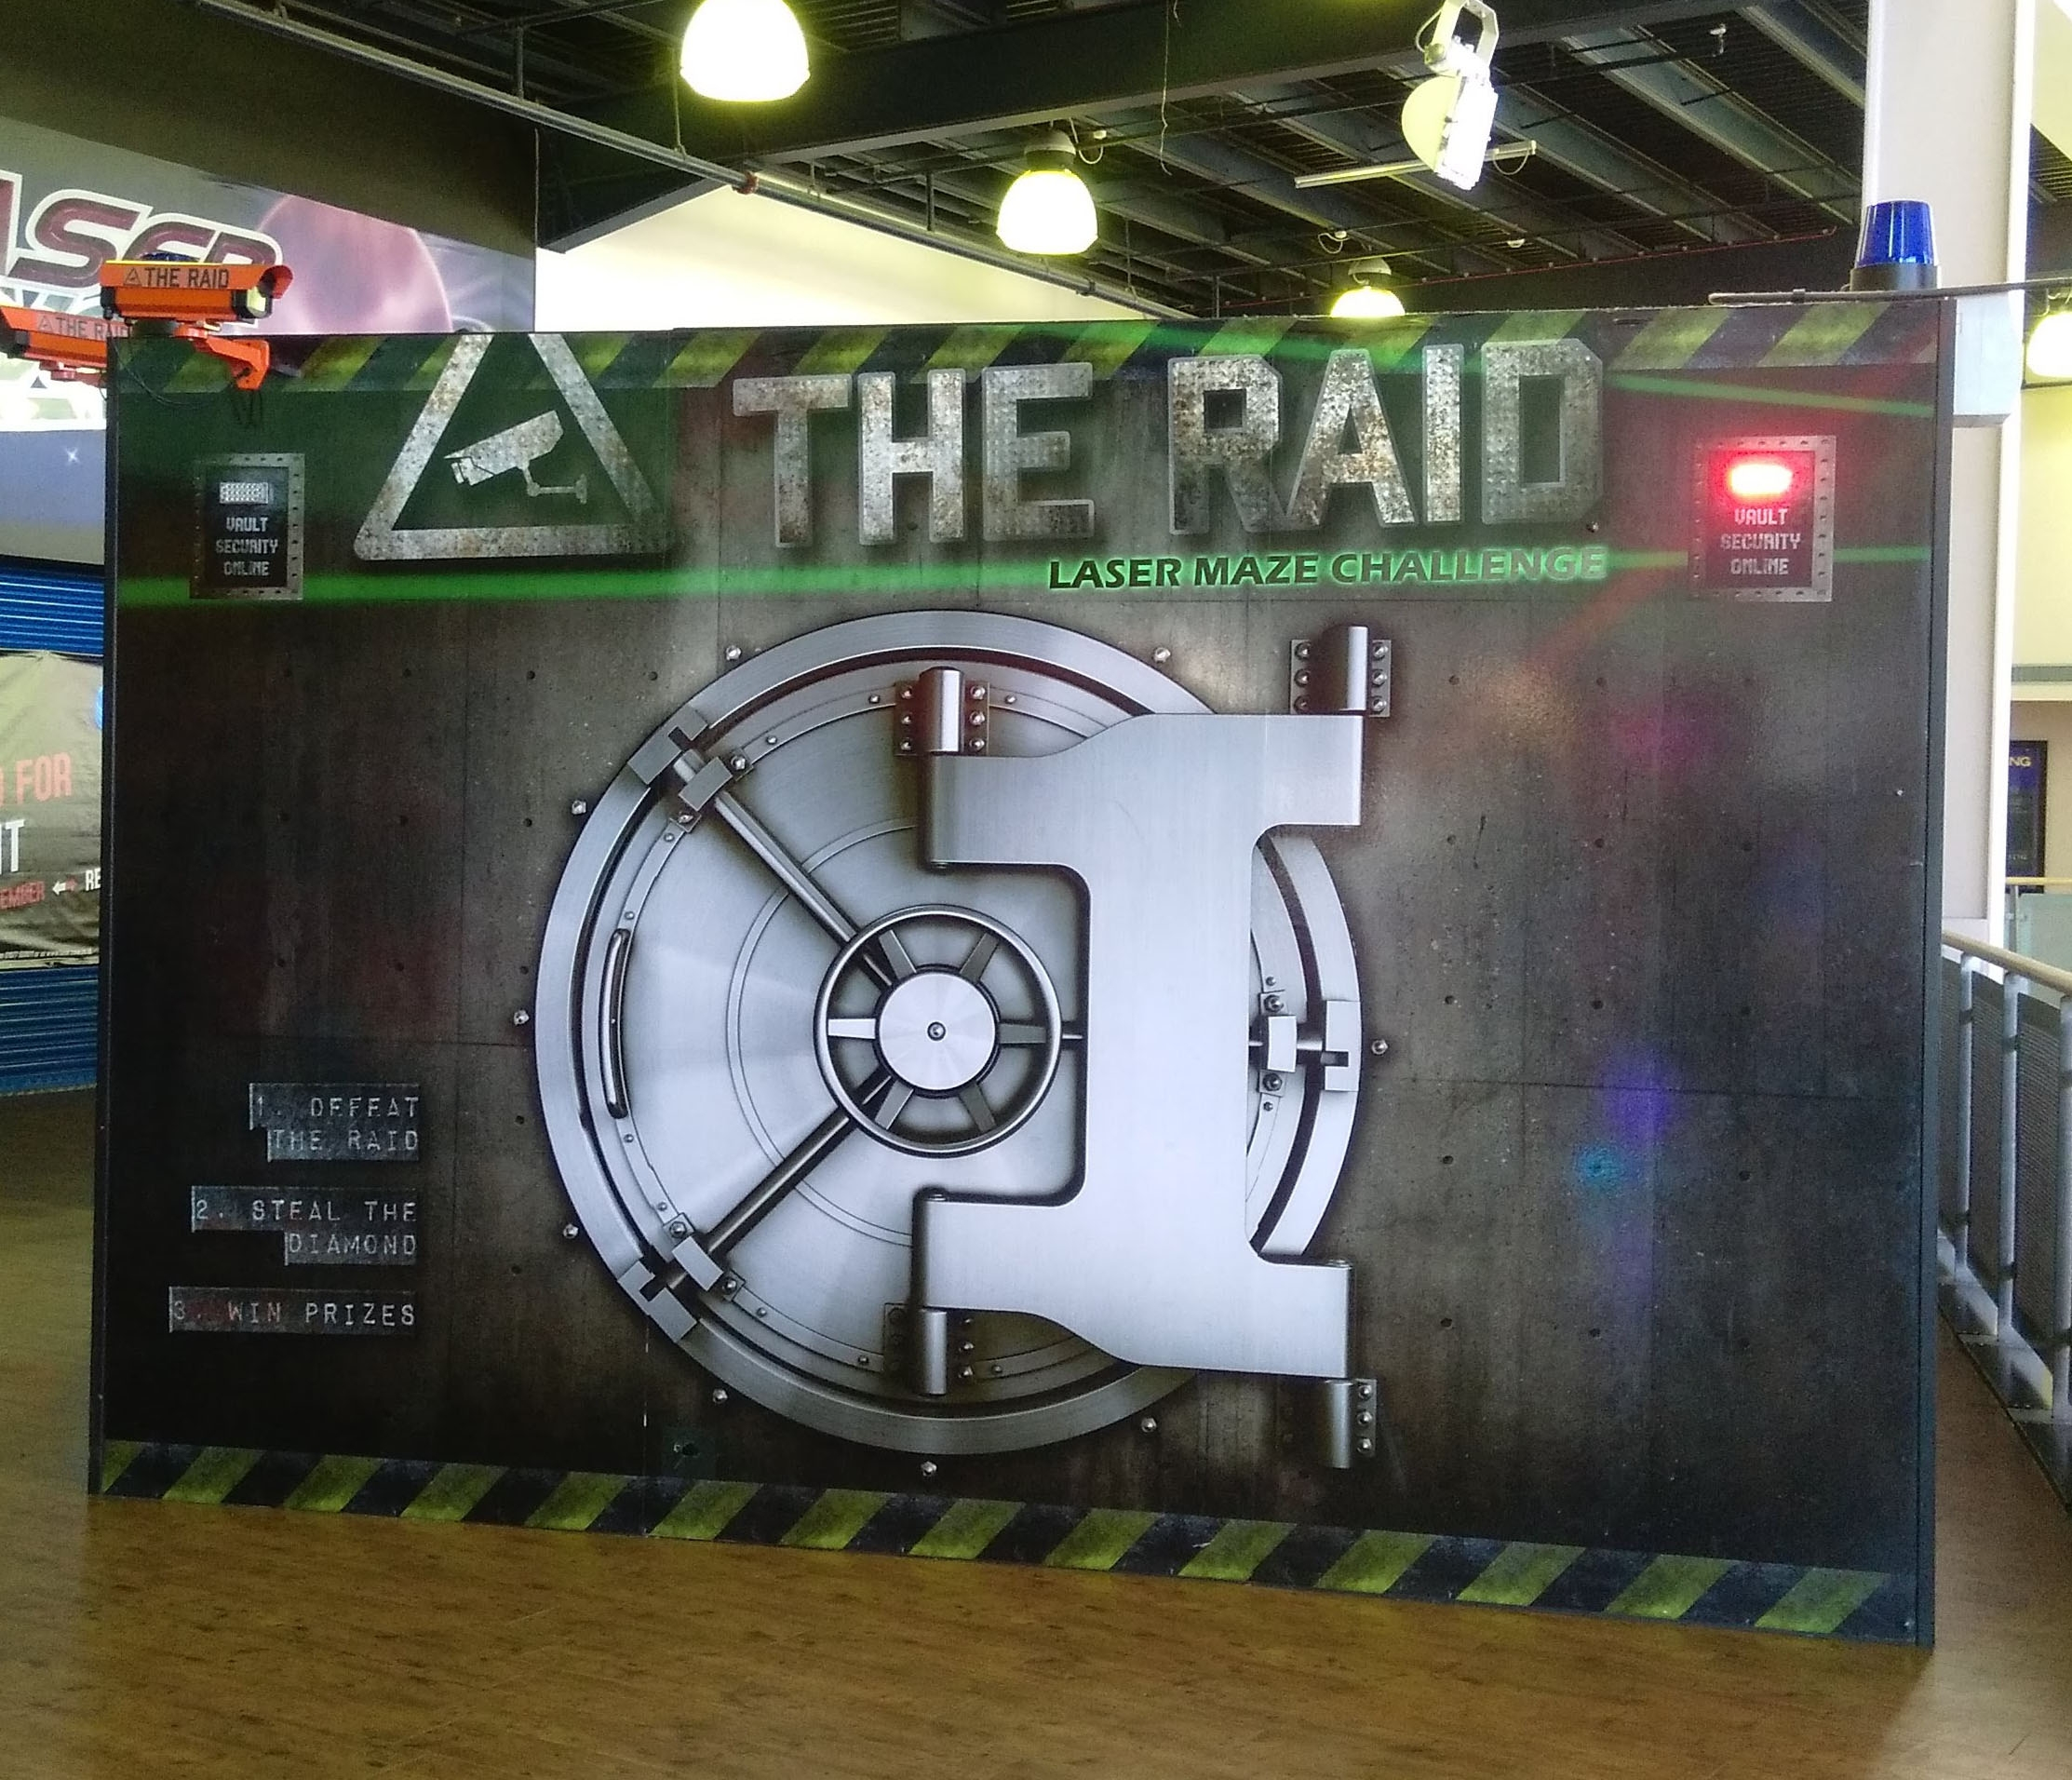 the raid at Xscape Castleford